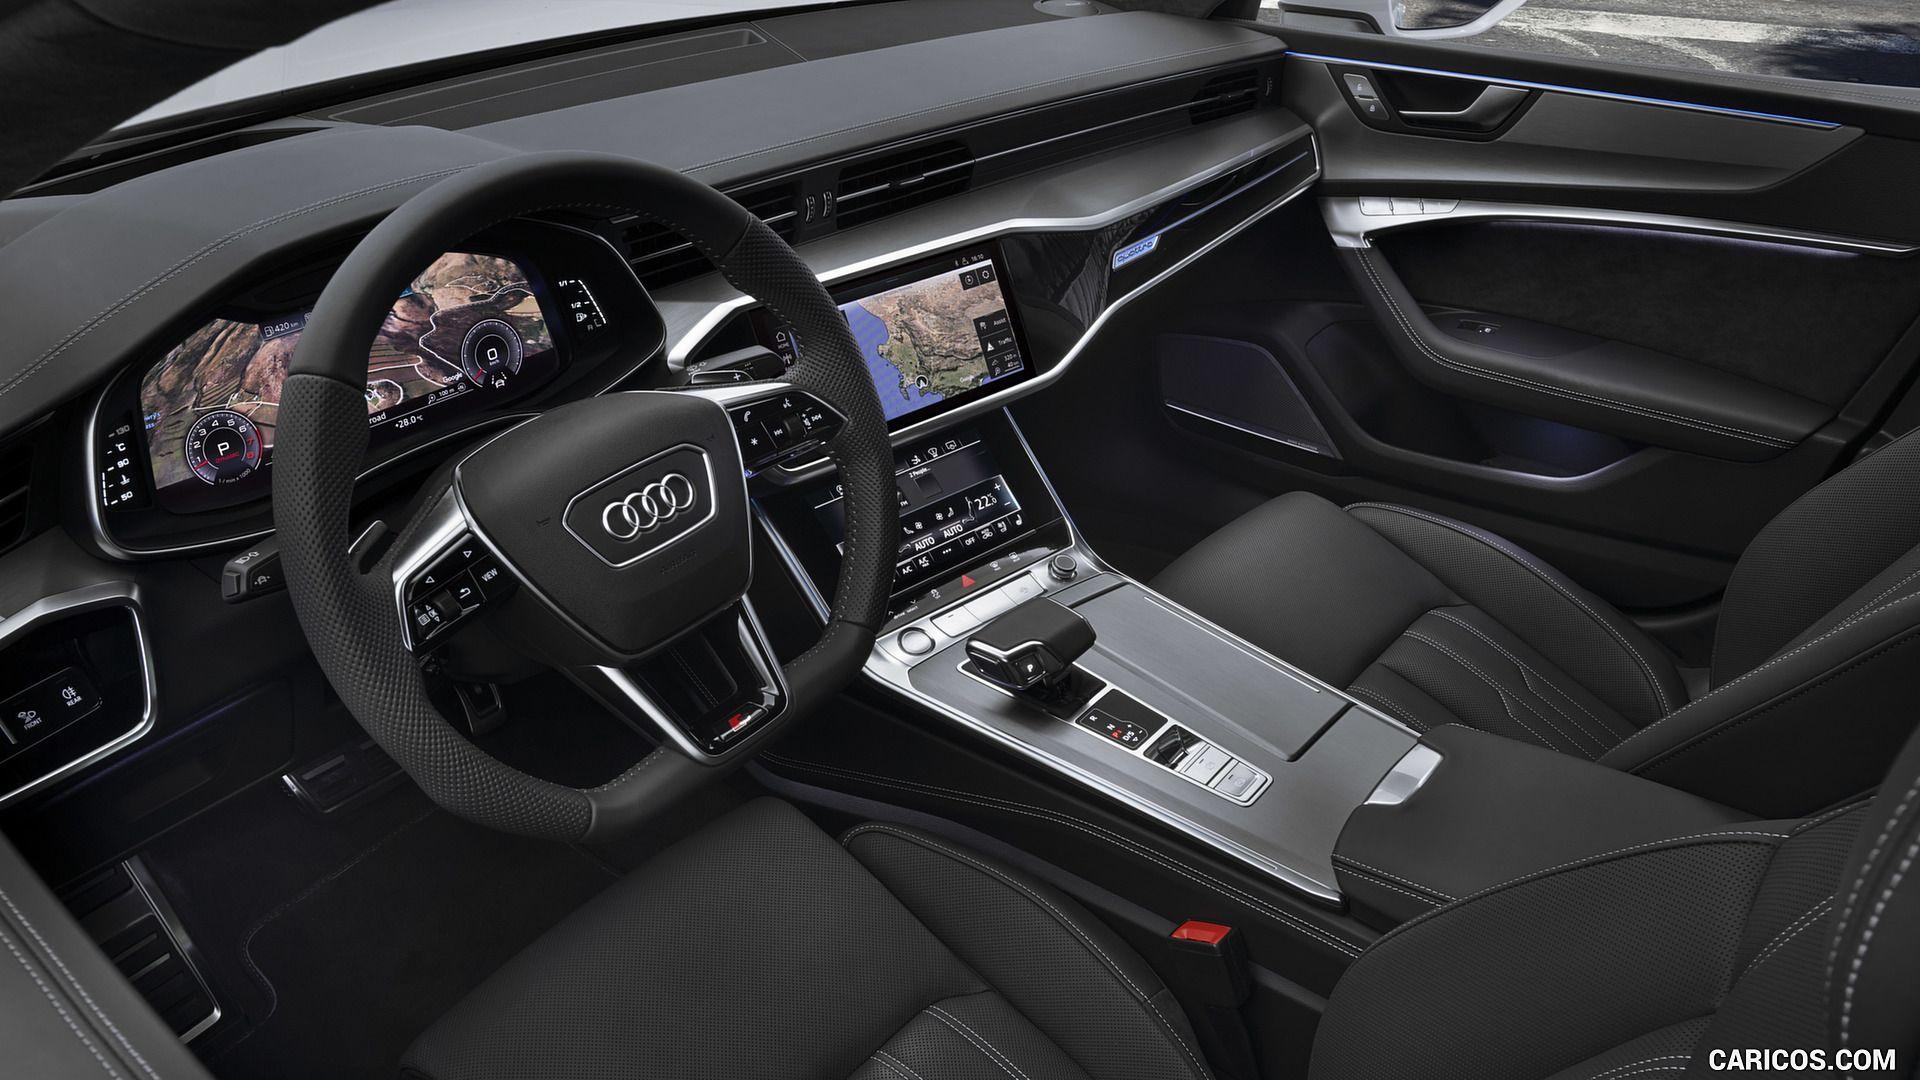 2019 Audi A7 Sportback Wallpaper Cars Pinterest Audi A7 Audi